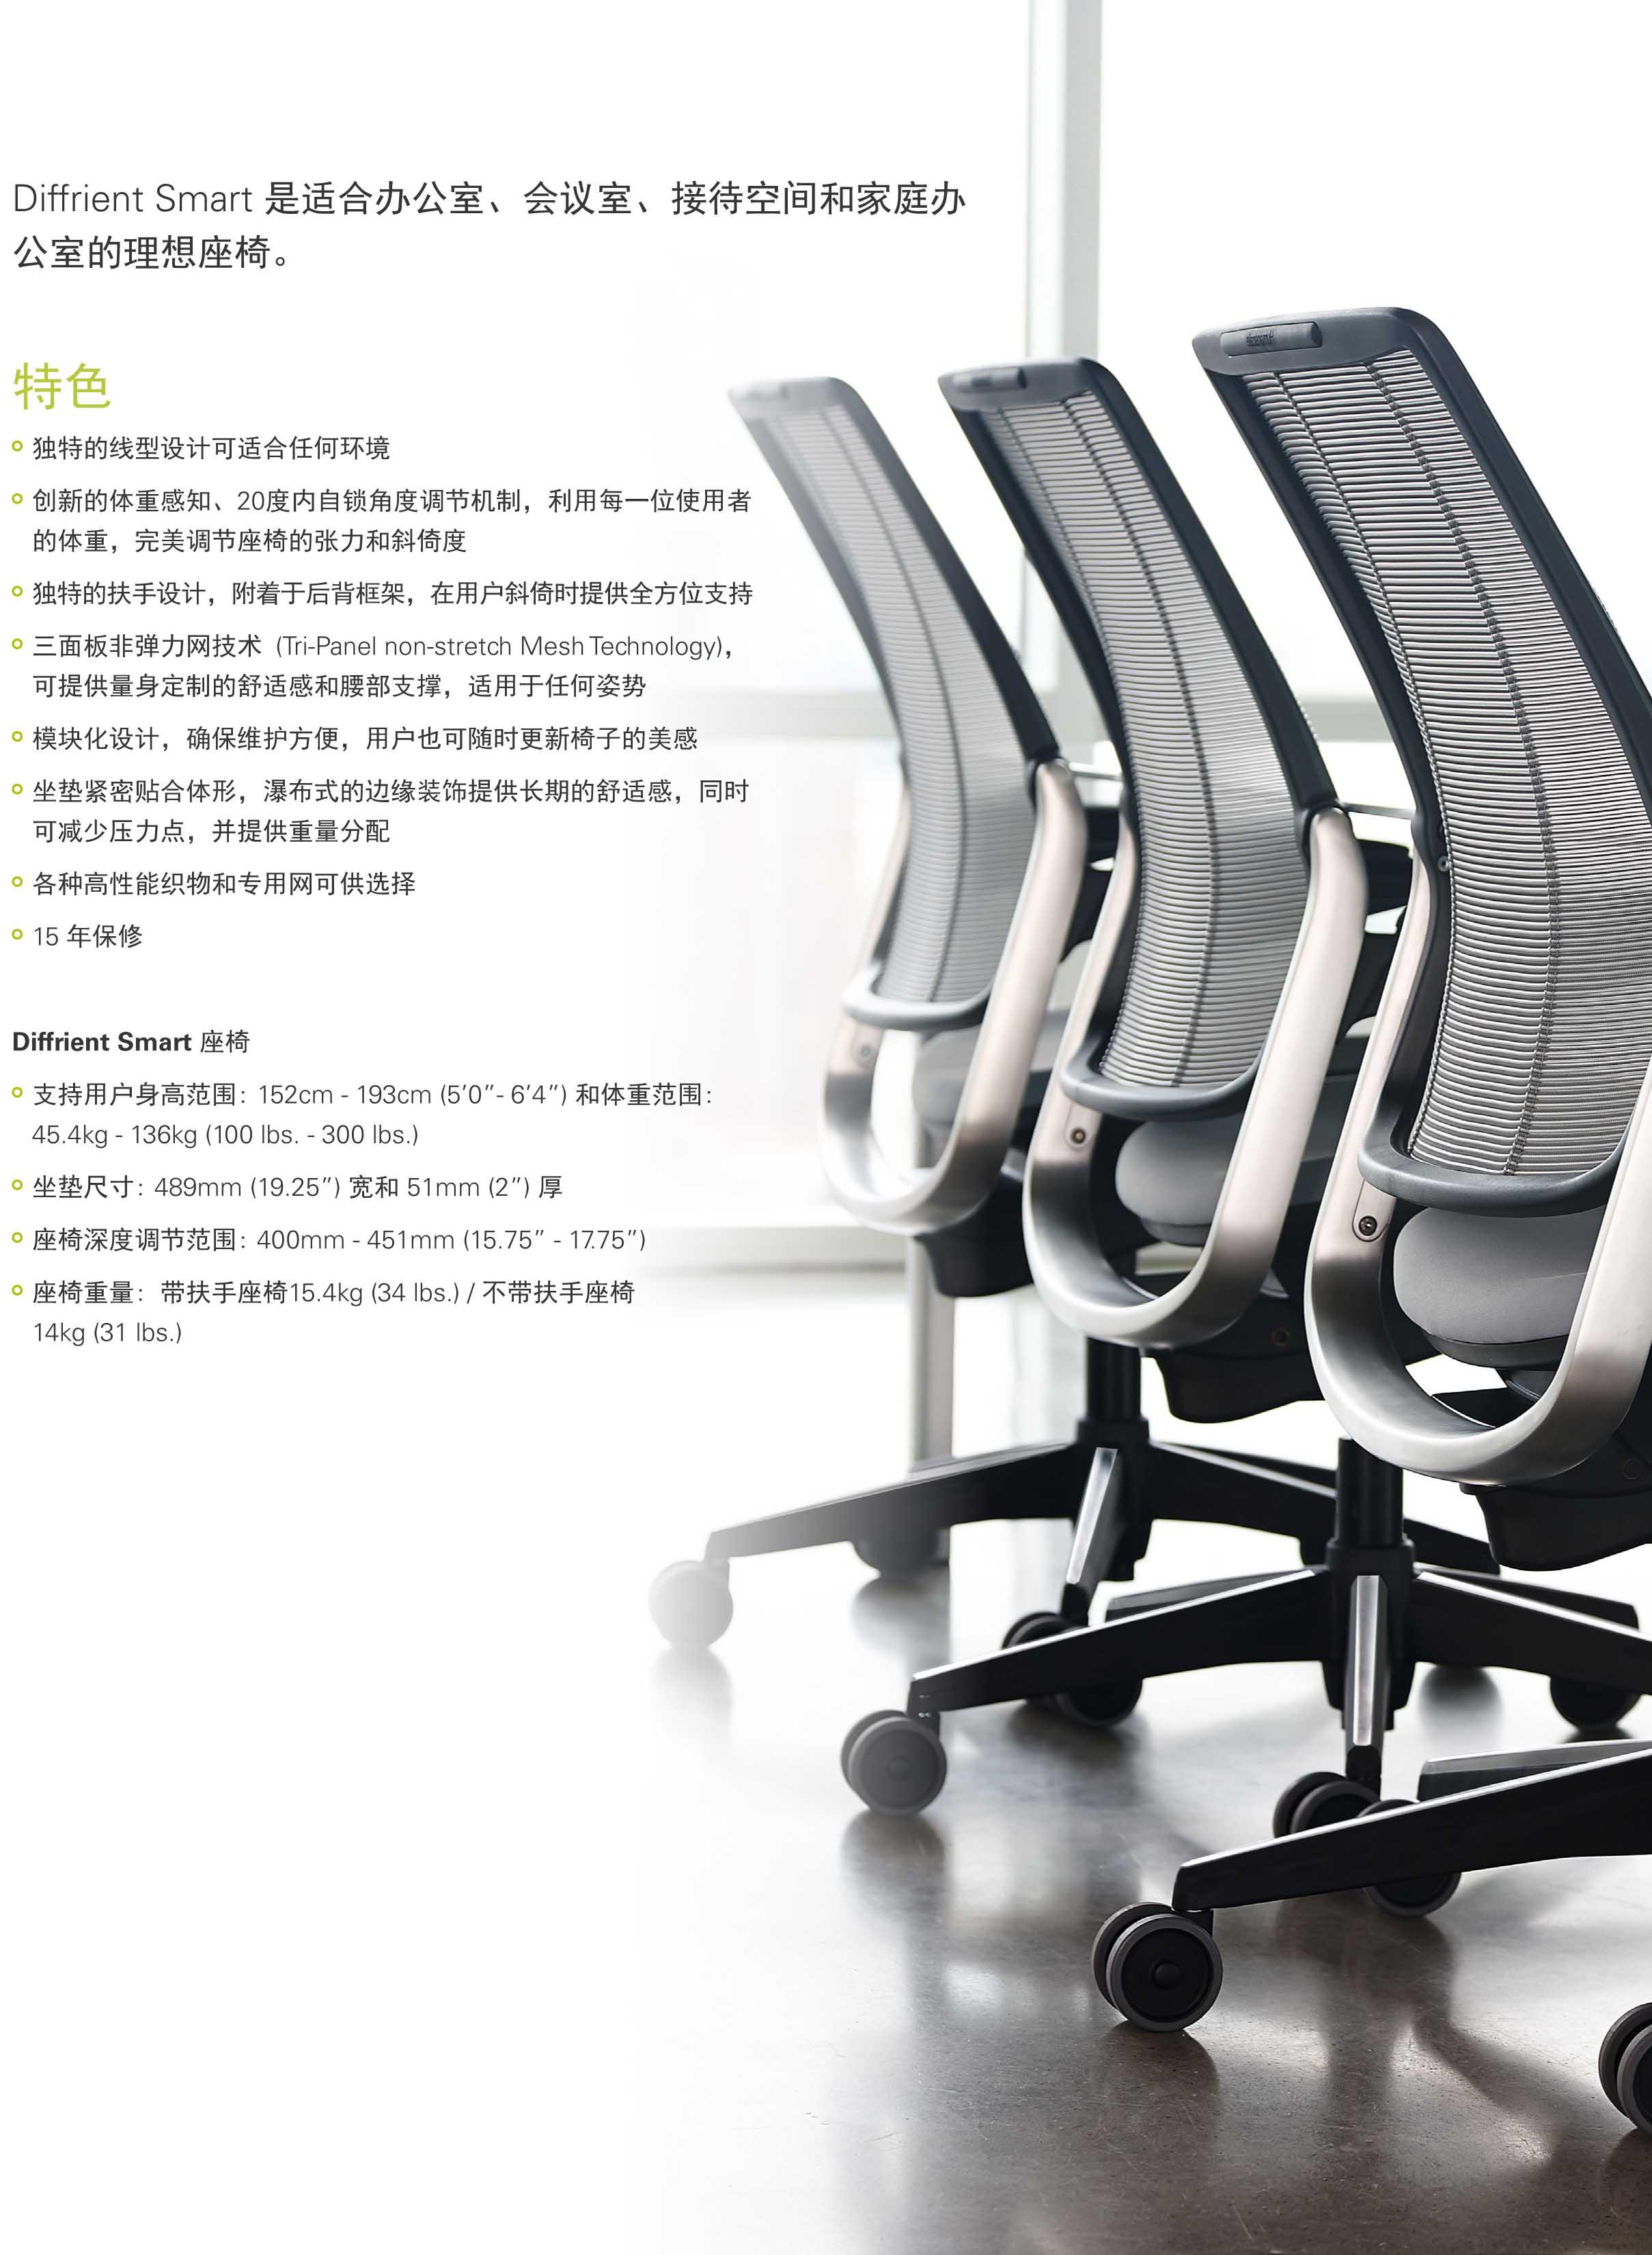 Smart_Brochure_032016_CN-3.jpg